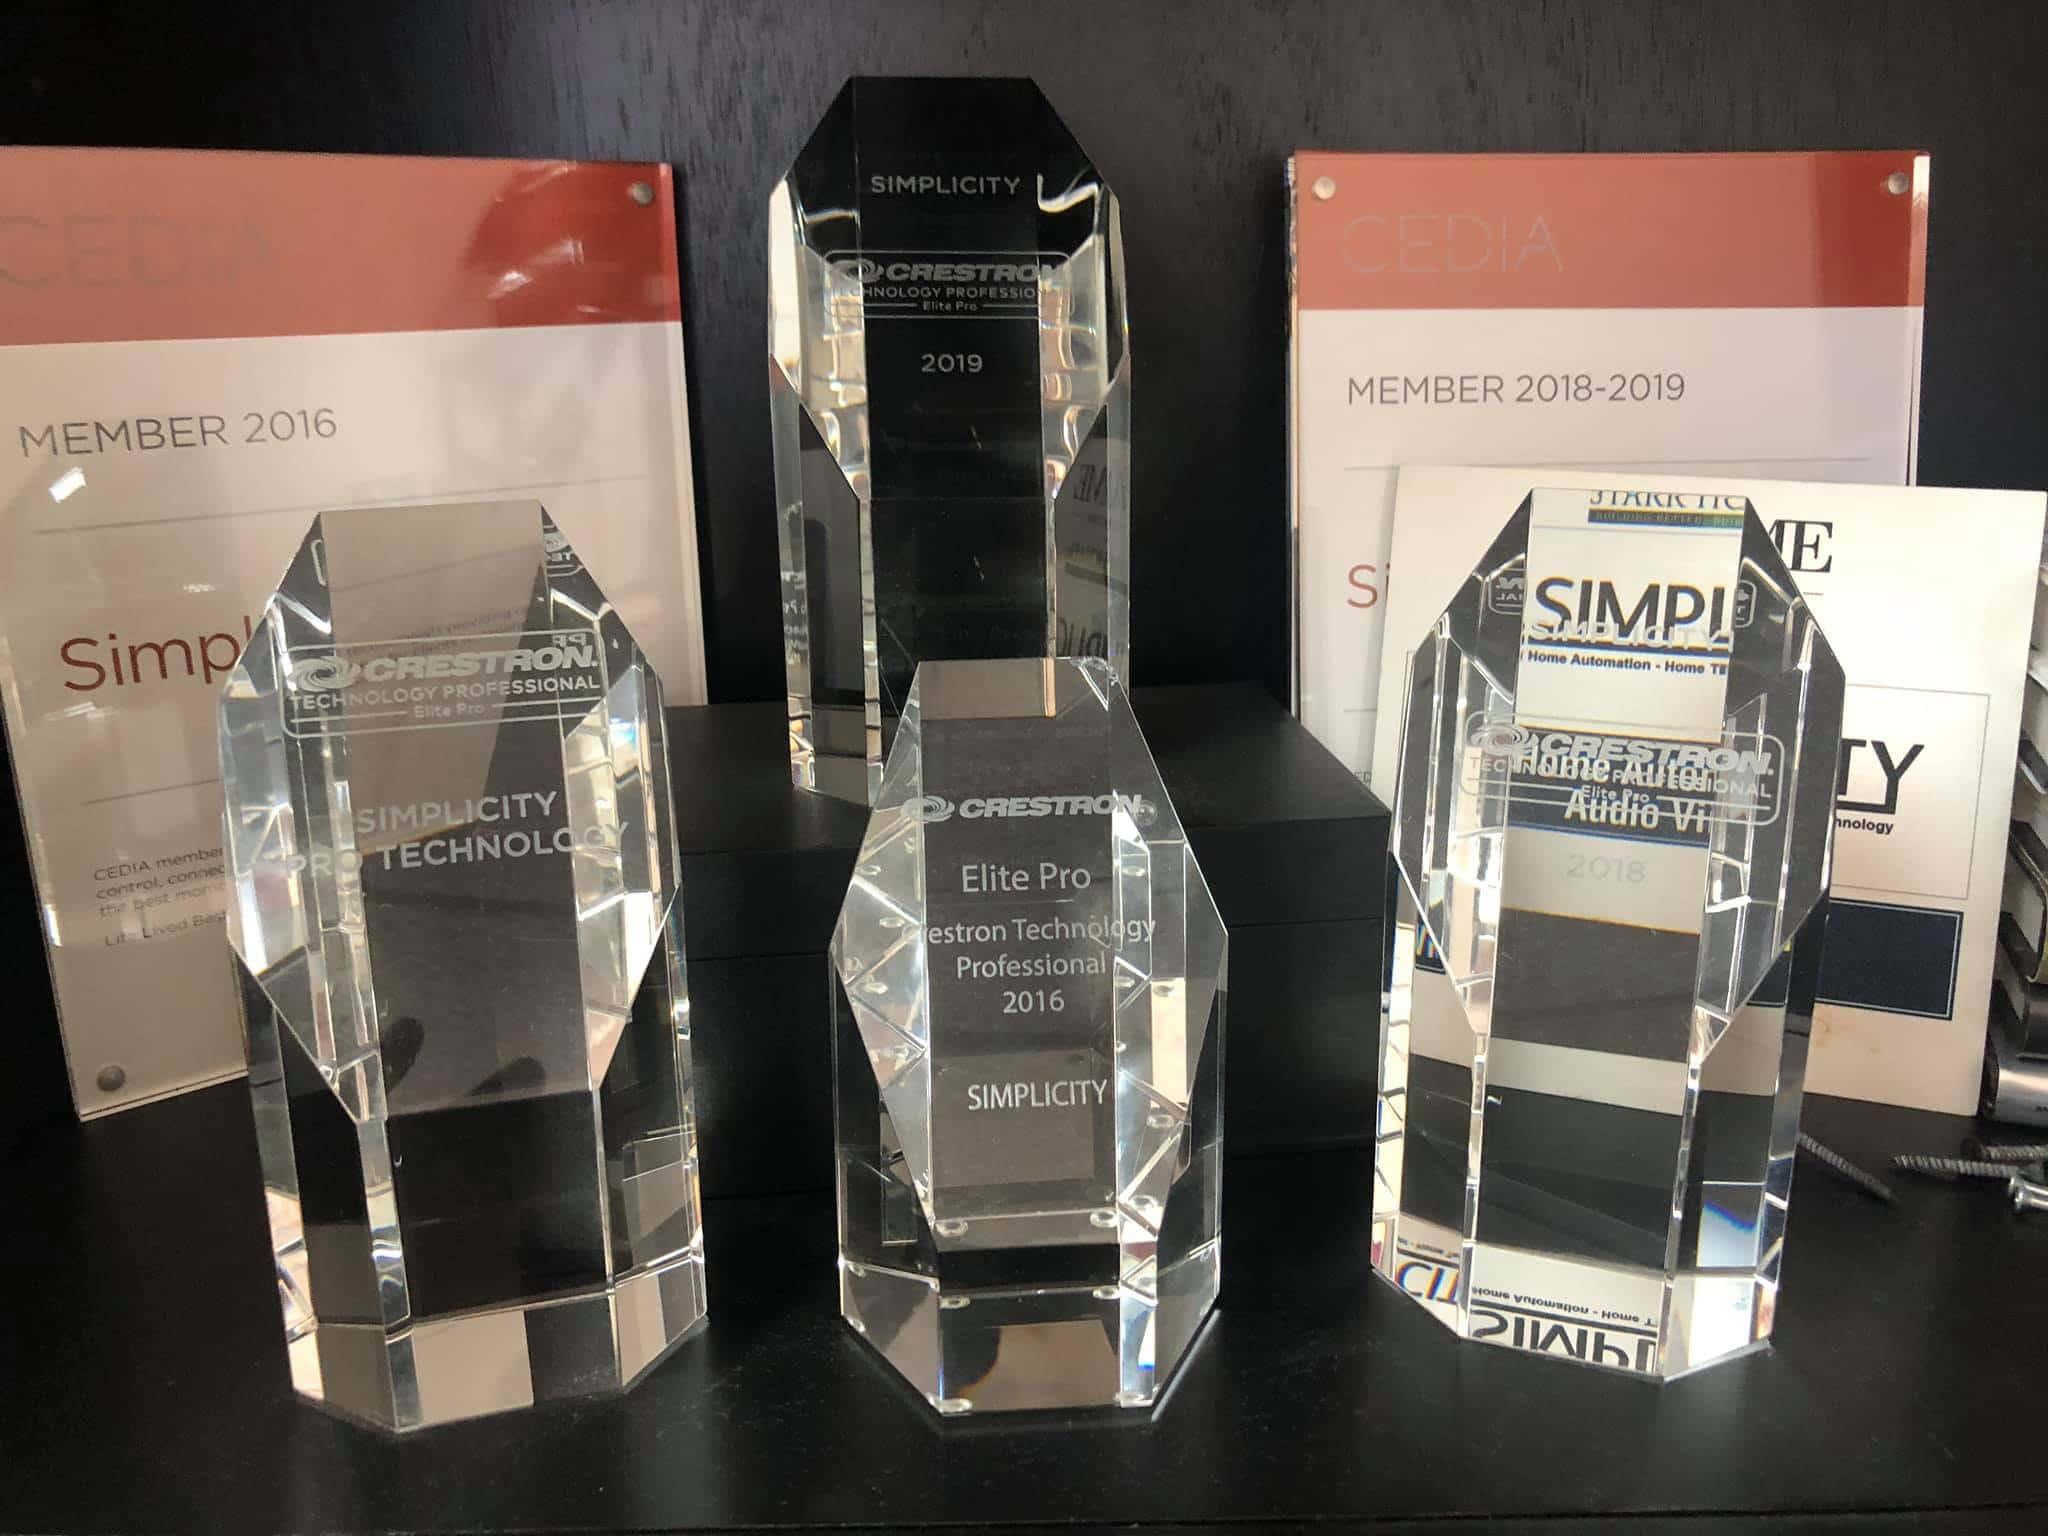 Simplicity crestron elite pro dealer awards.